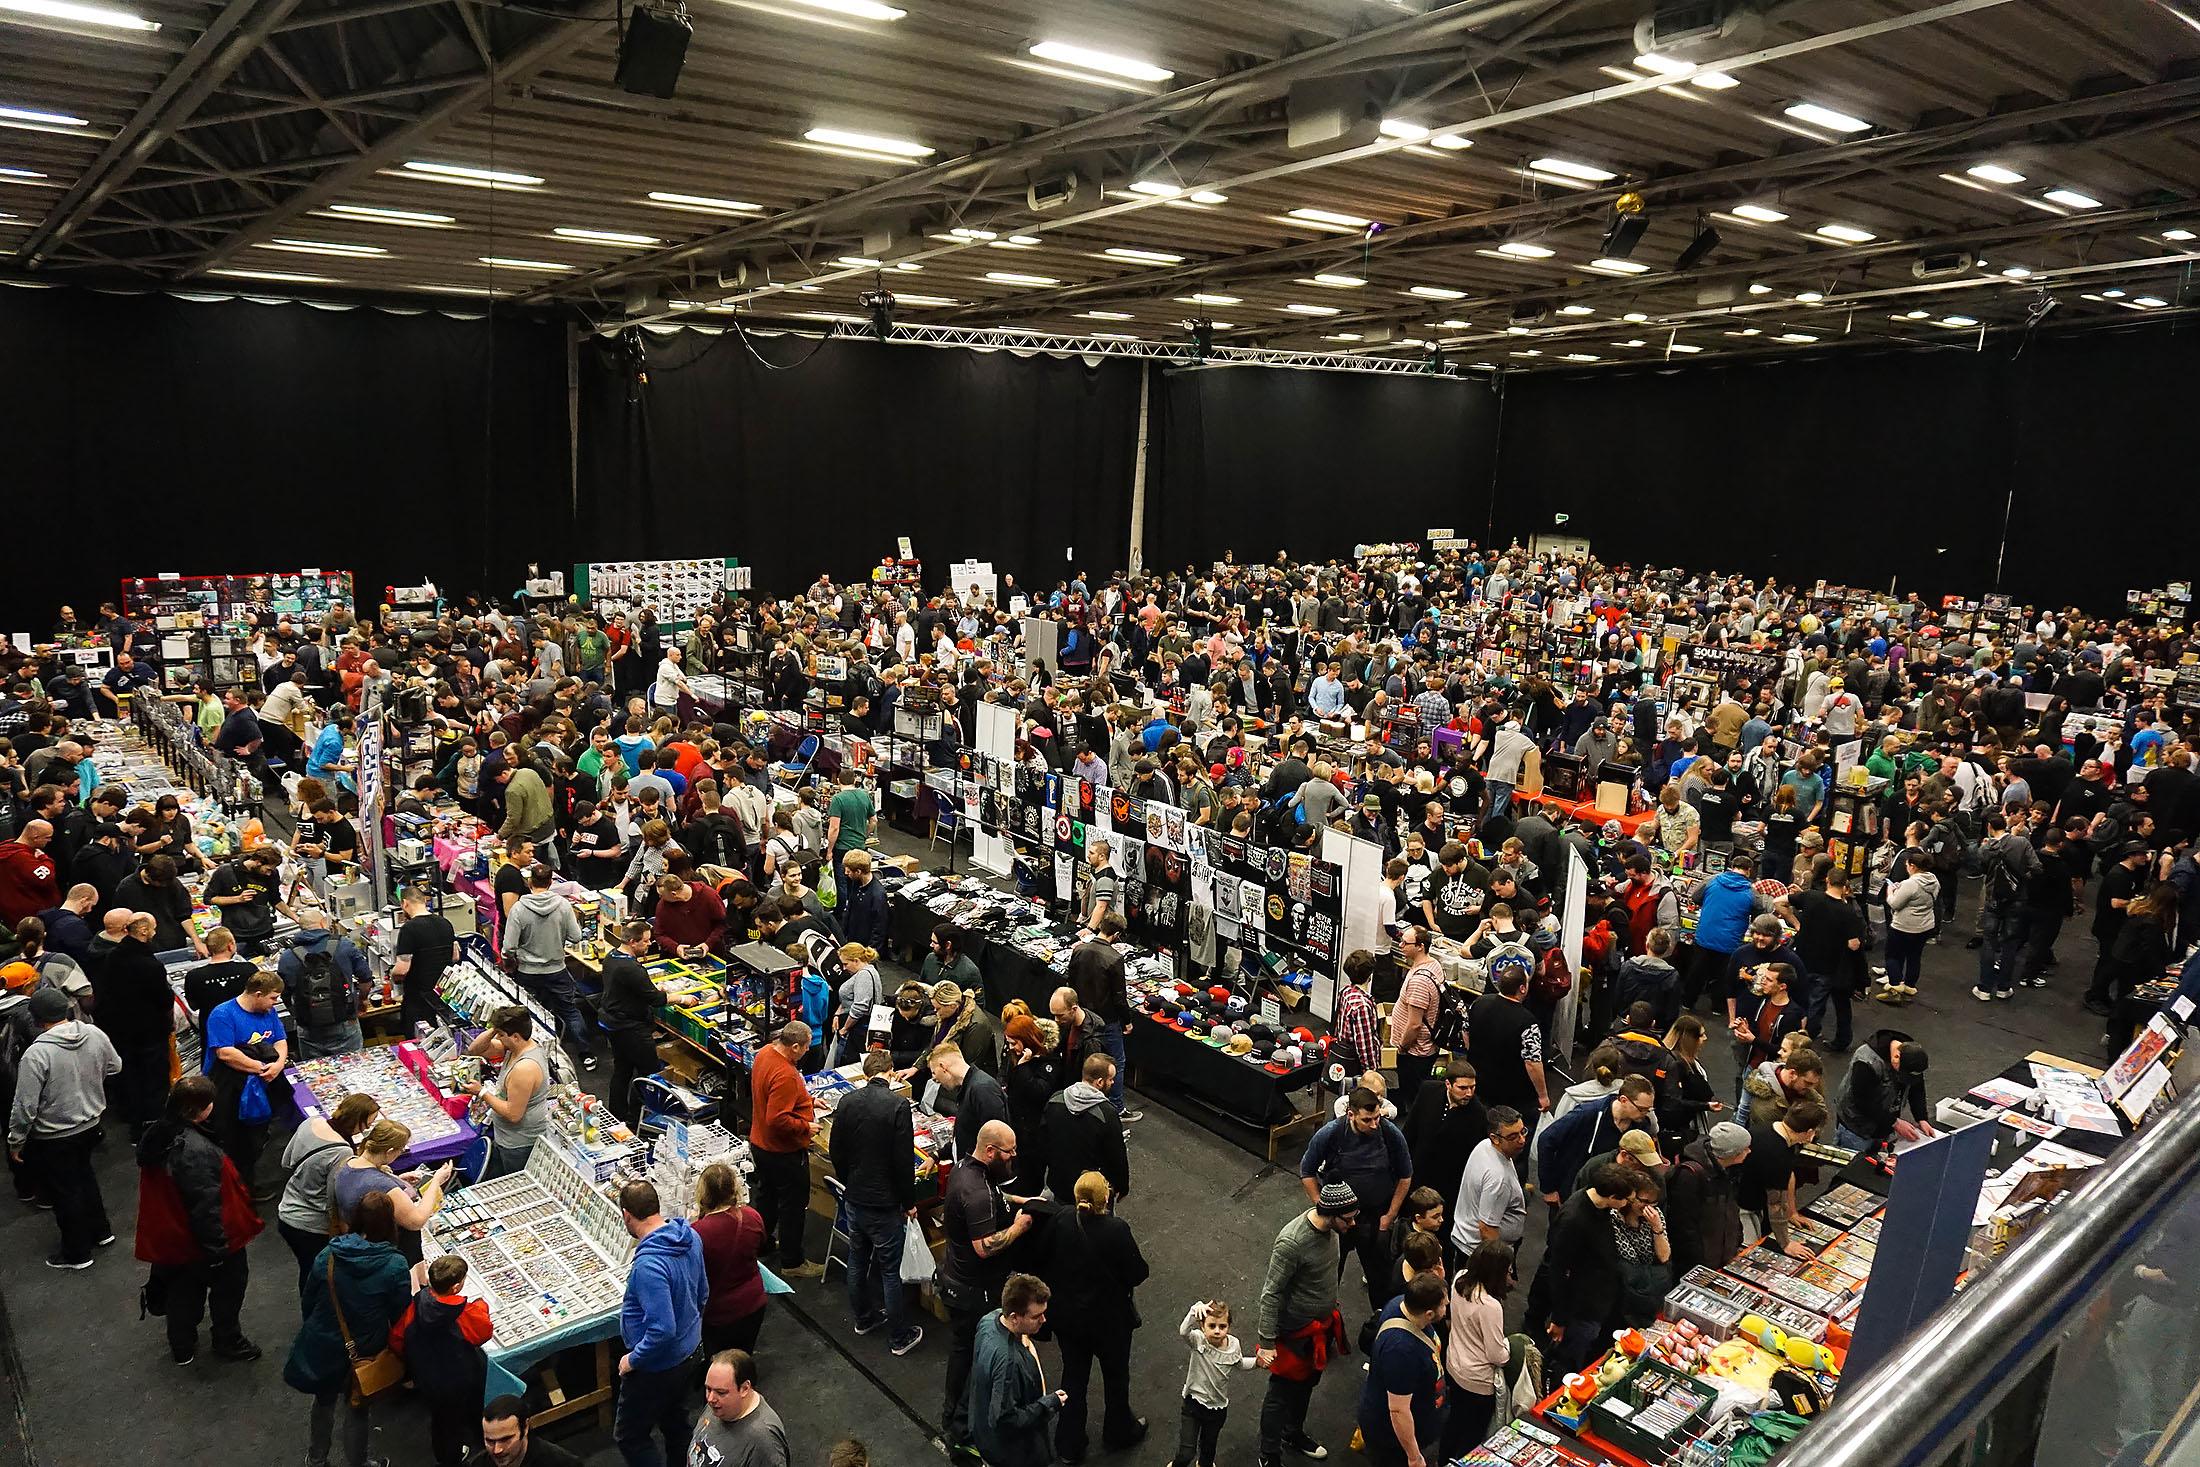 The UKs Biggest Retro Video Gaming Fair: The Video Game Market in 40 photos